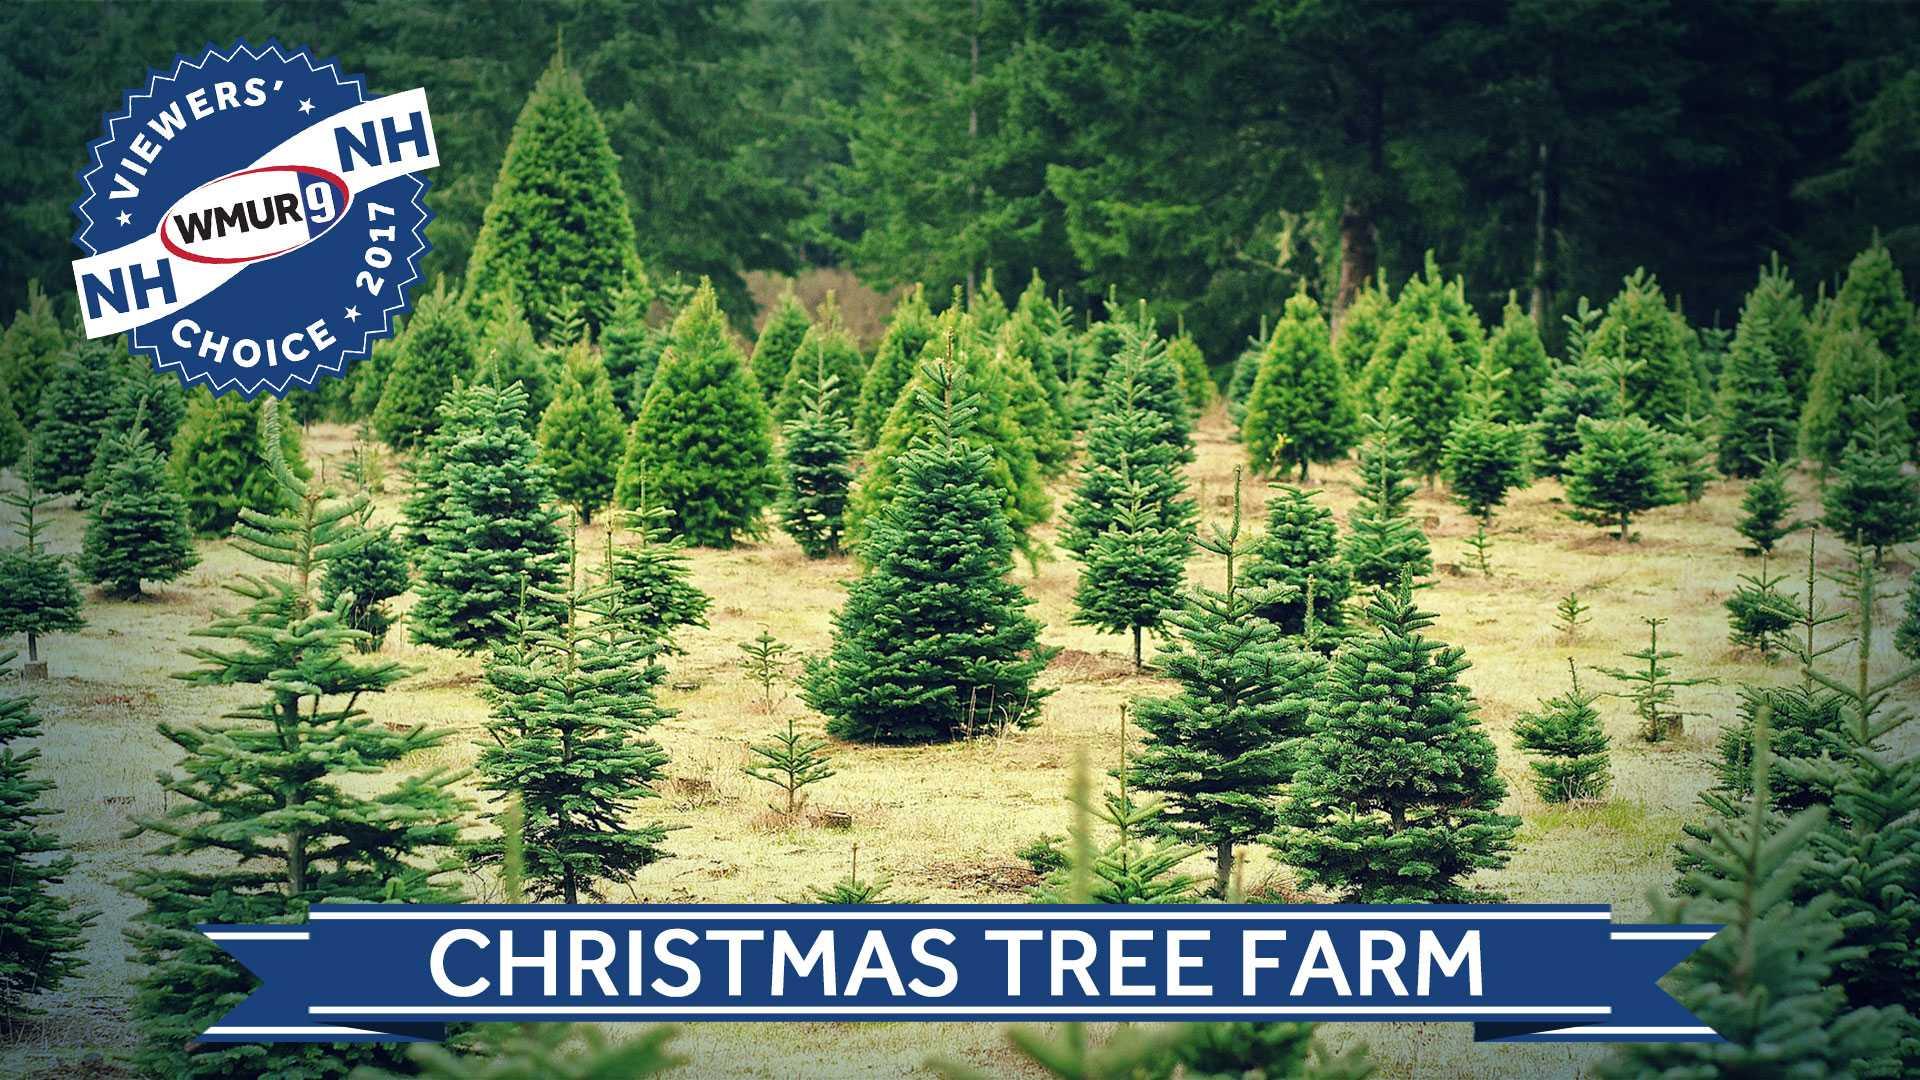 Viewers' Choice Christmas tree farm